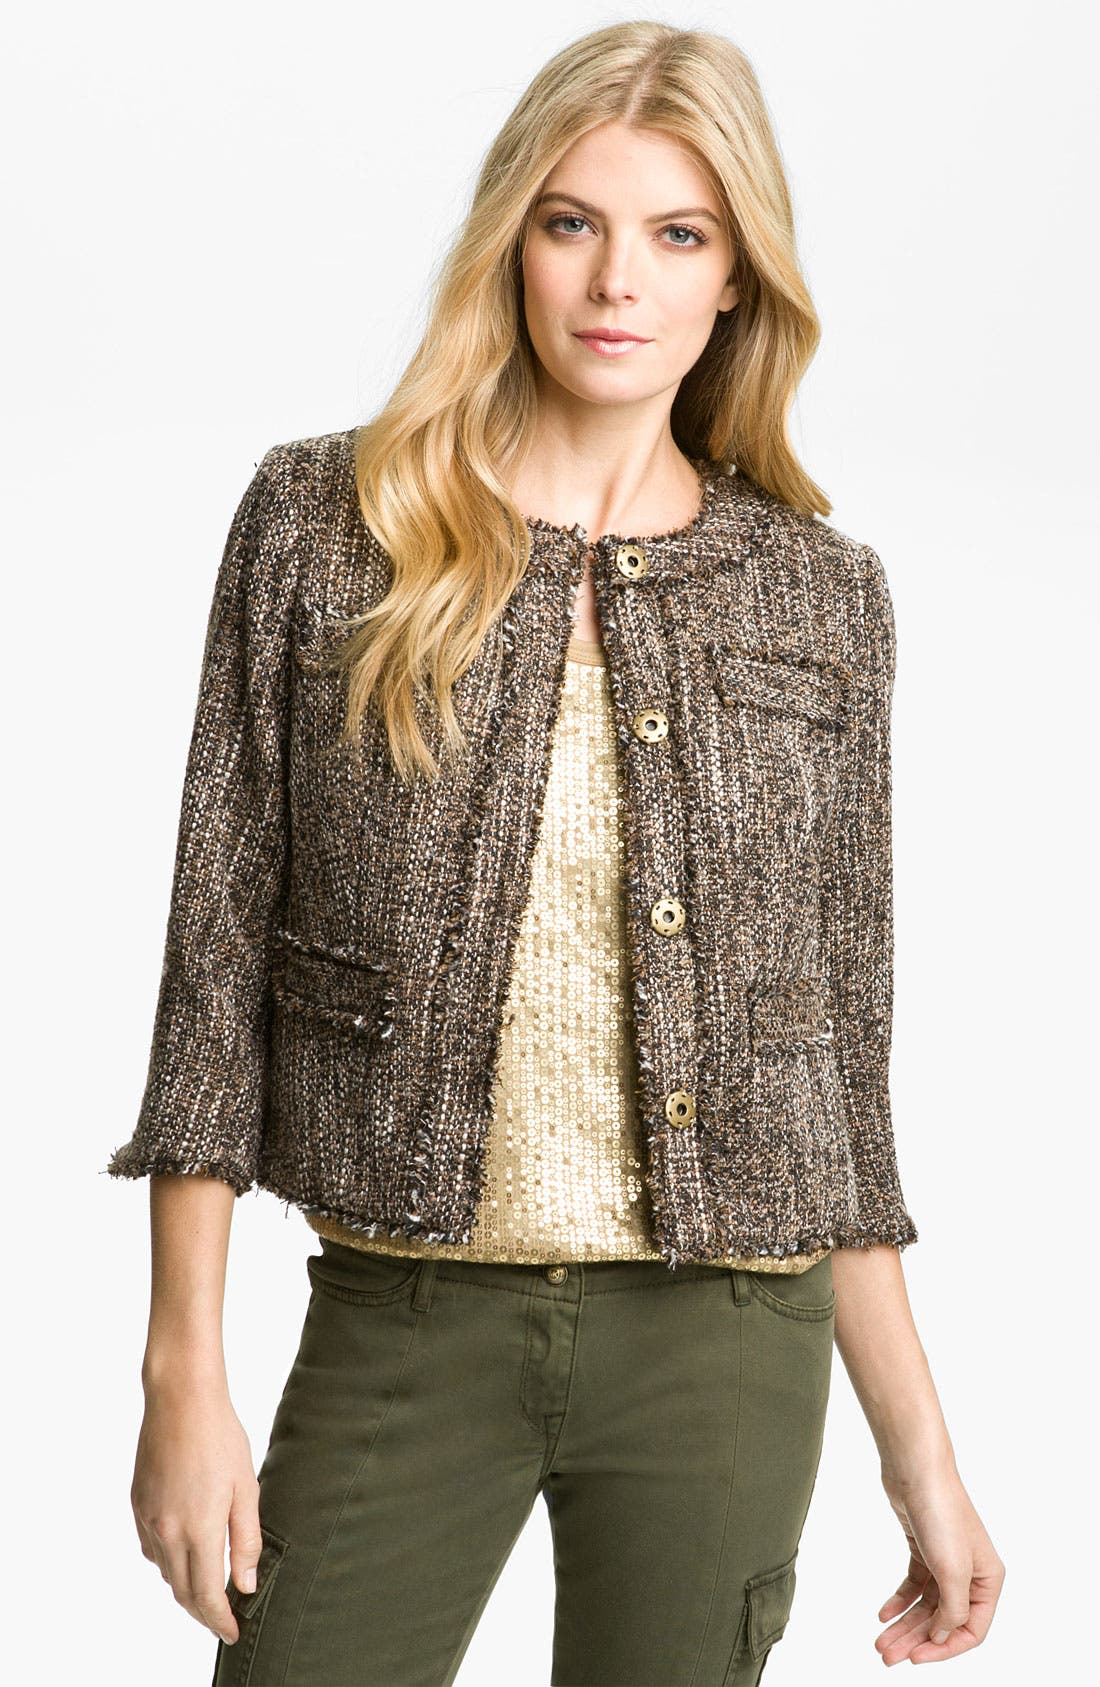 Alternate Image 1 Selected - MICHAEL Michael Kors Tweed Knit Jacket (Petite)